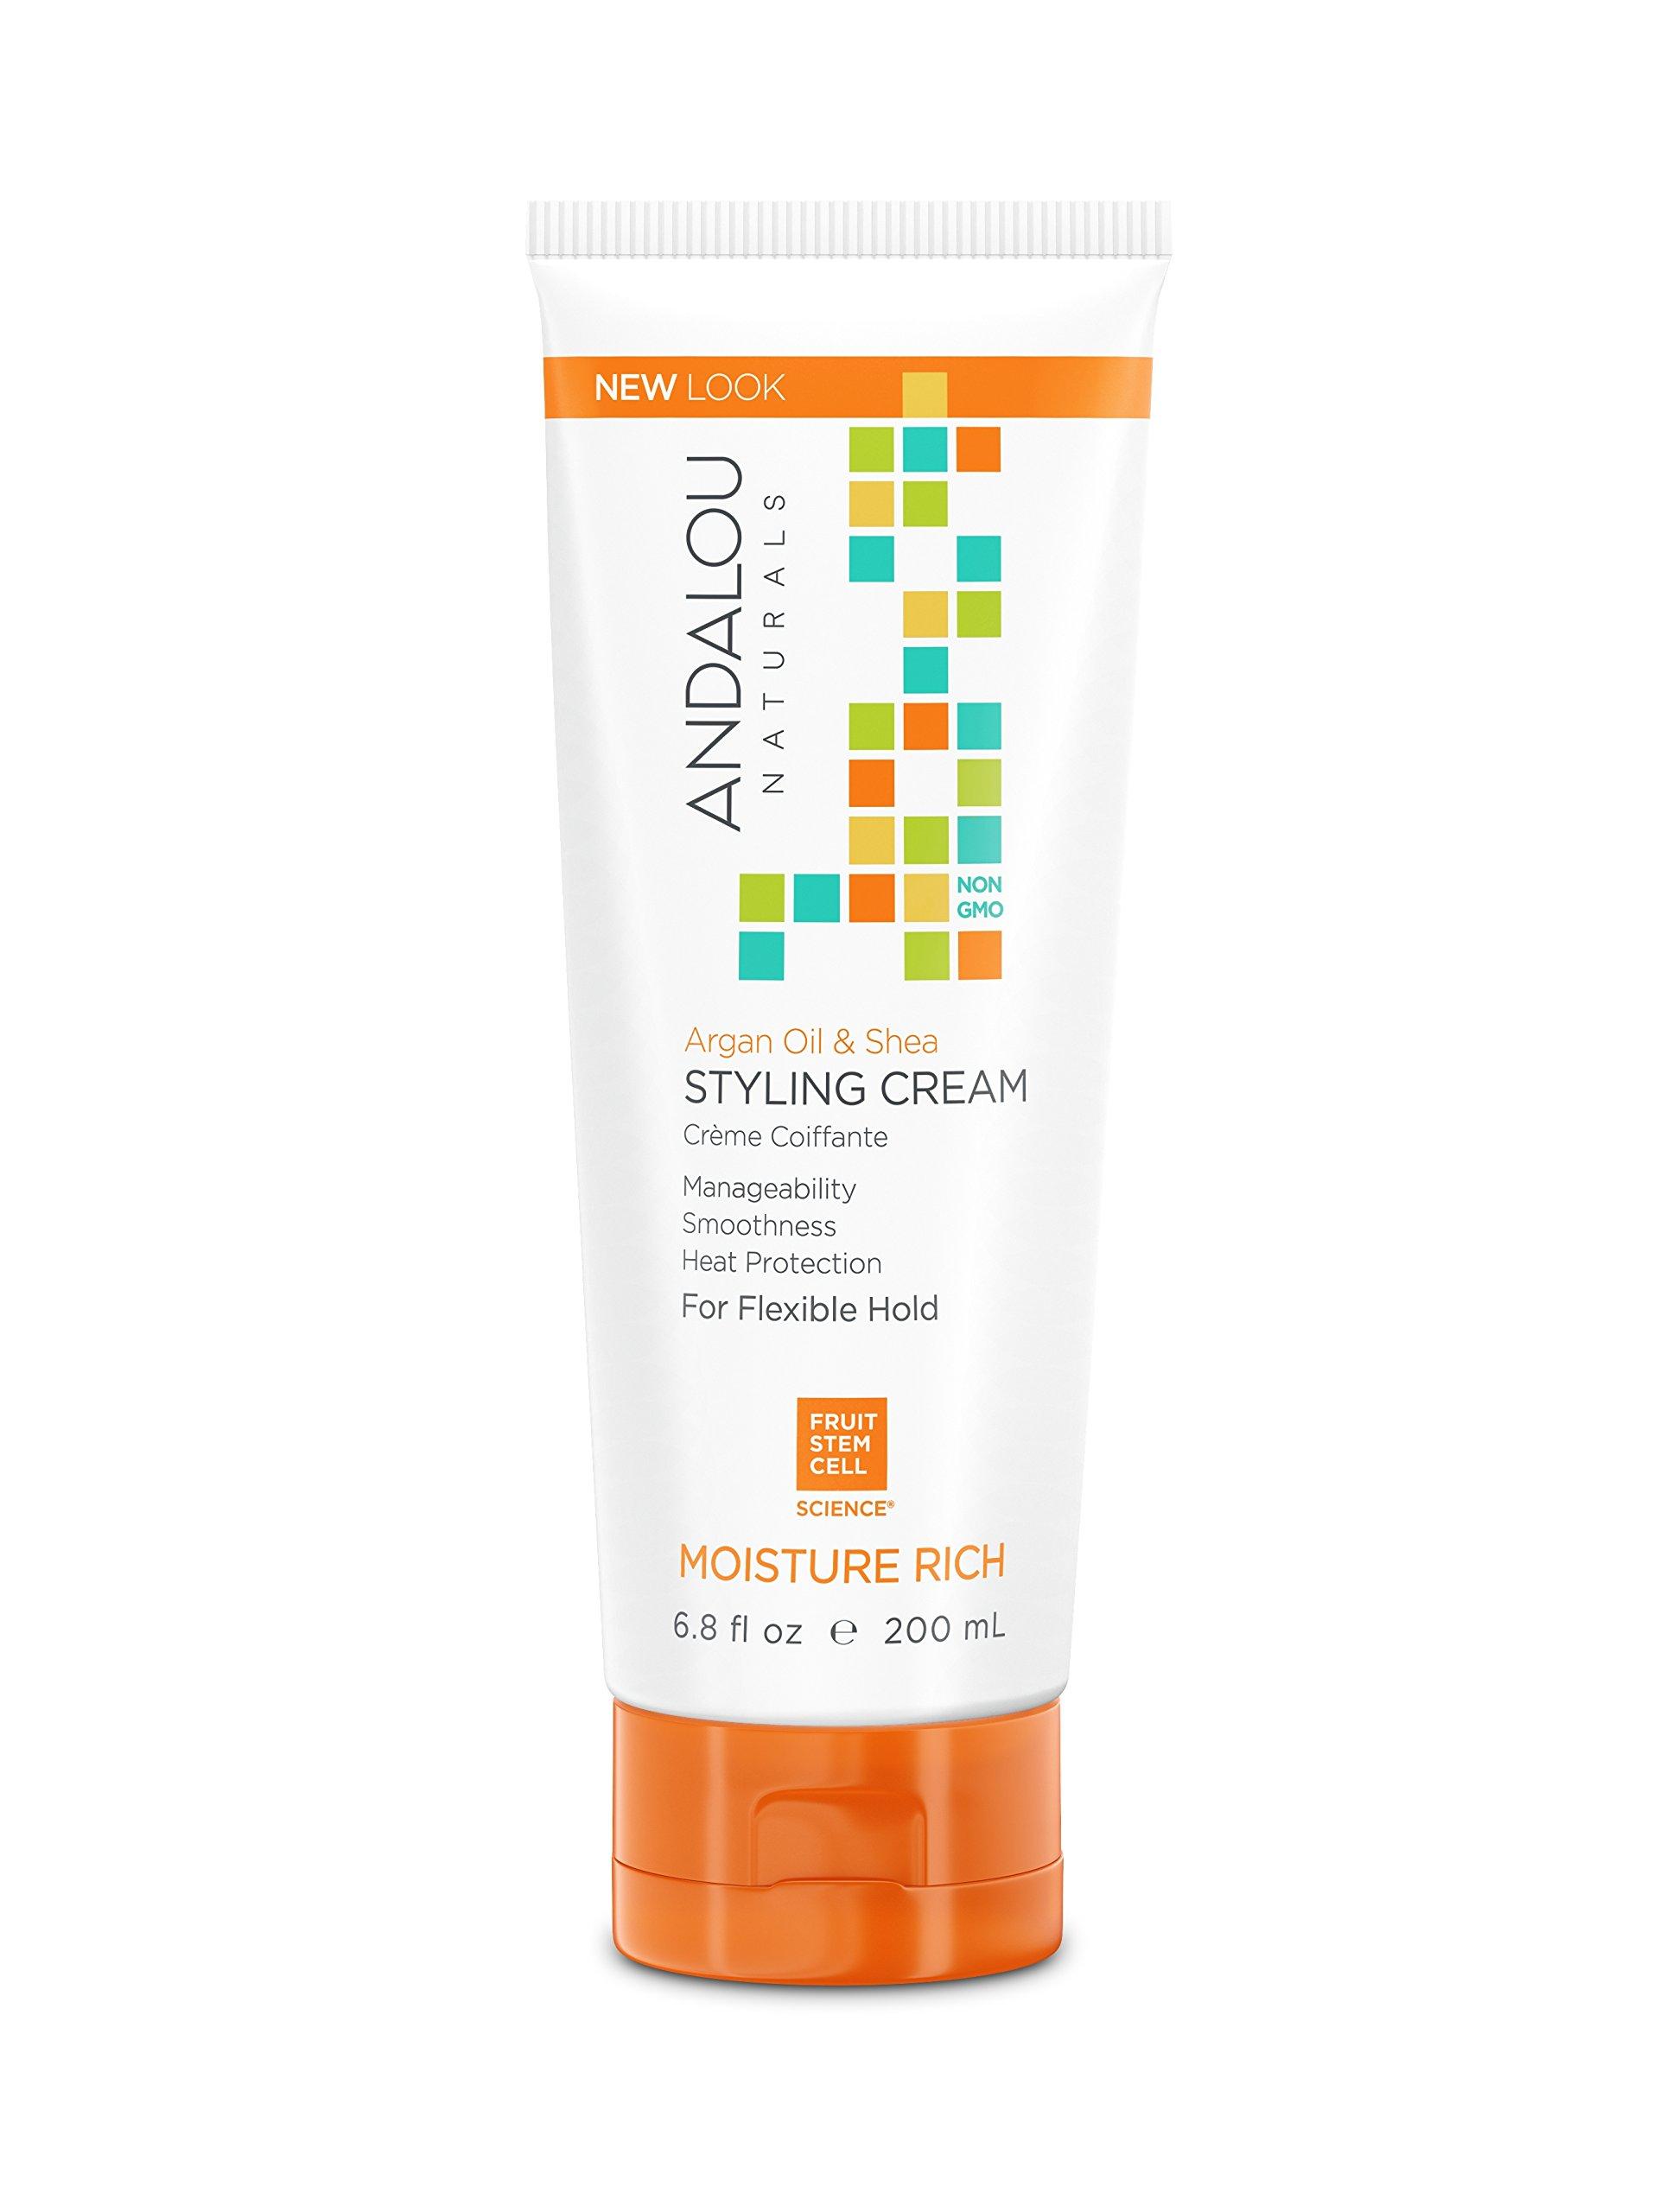 Andalou Naturals Argan Oil & Shea Styling Cream, 6.8 oz